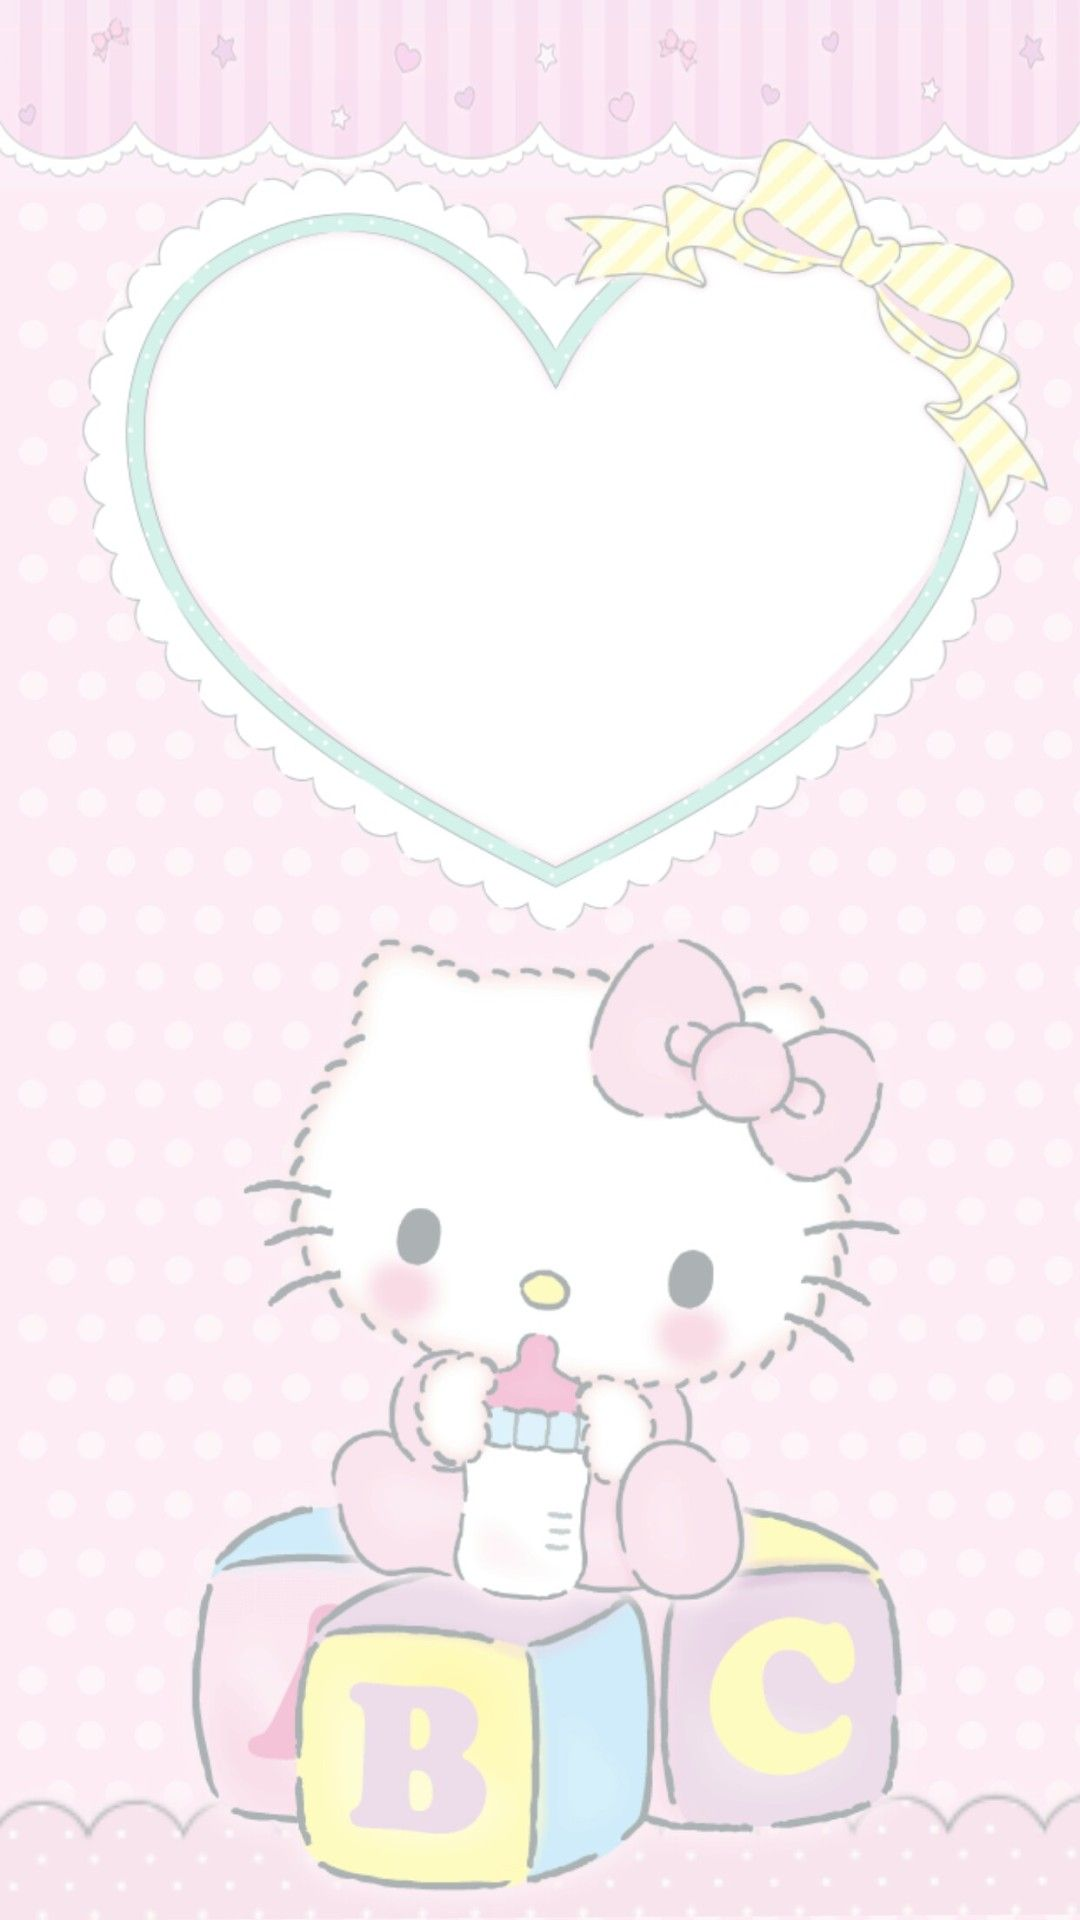 Sesshoumaru Kawaii Baby Sanrio Wallpapers If Use My Walls Hello Kitty Hello Kitty Wallpaper Sanrio Wallpaper